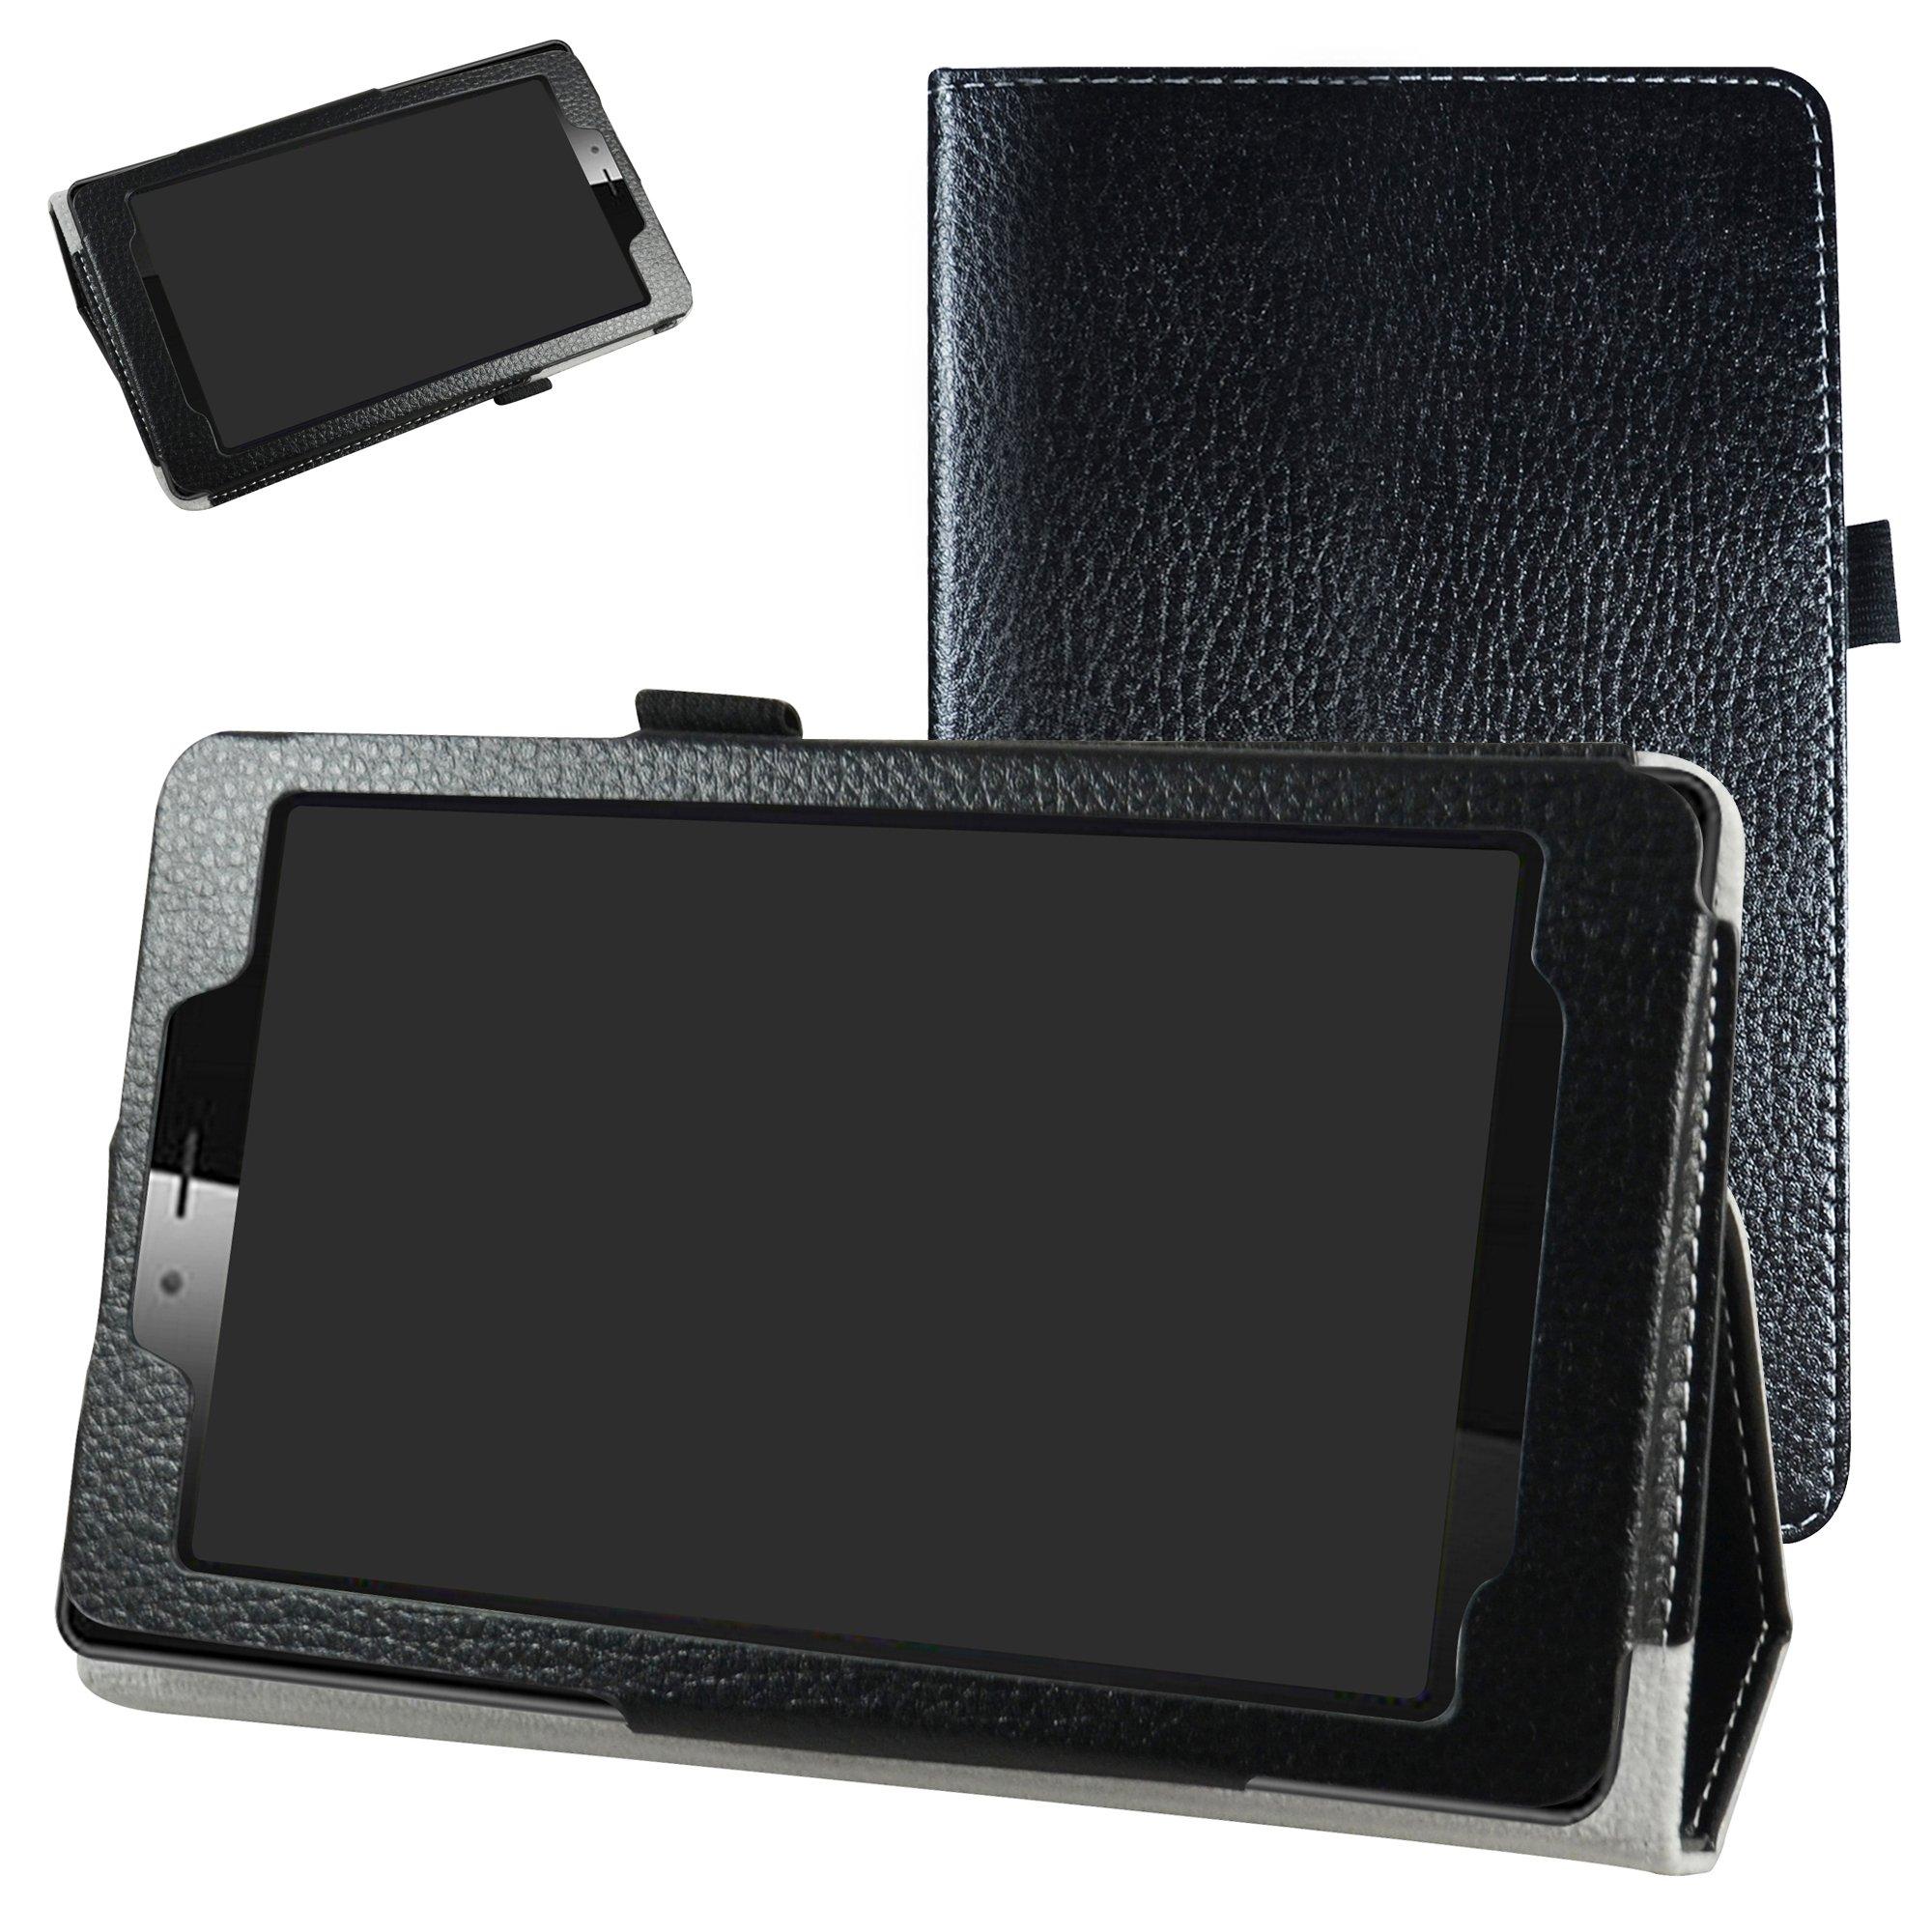 "Mama Mouth vodafone smart tab mini 7 / ALCATEL pixi 4 7 Case, PU Leather Folio 2-folding Stand Cover for 7"" vodafone smart tab mini 7 / ALCATEL pixi 4 7 Android Tablet 2016,Black"